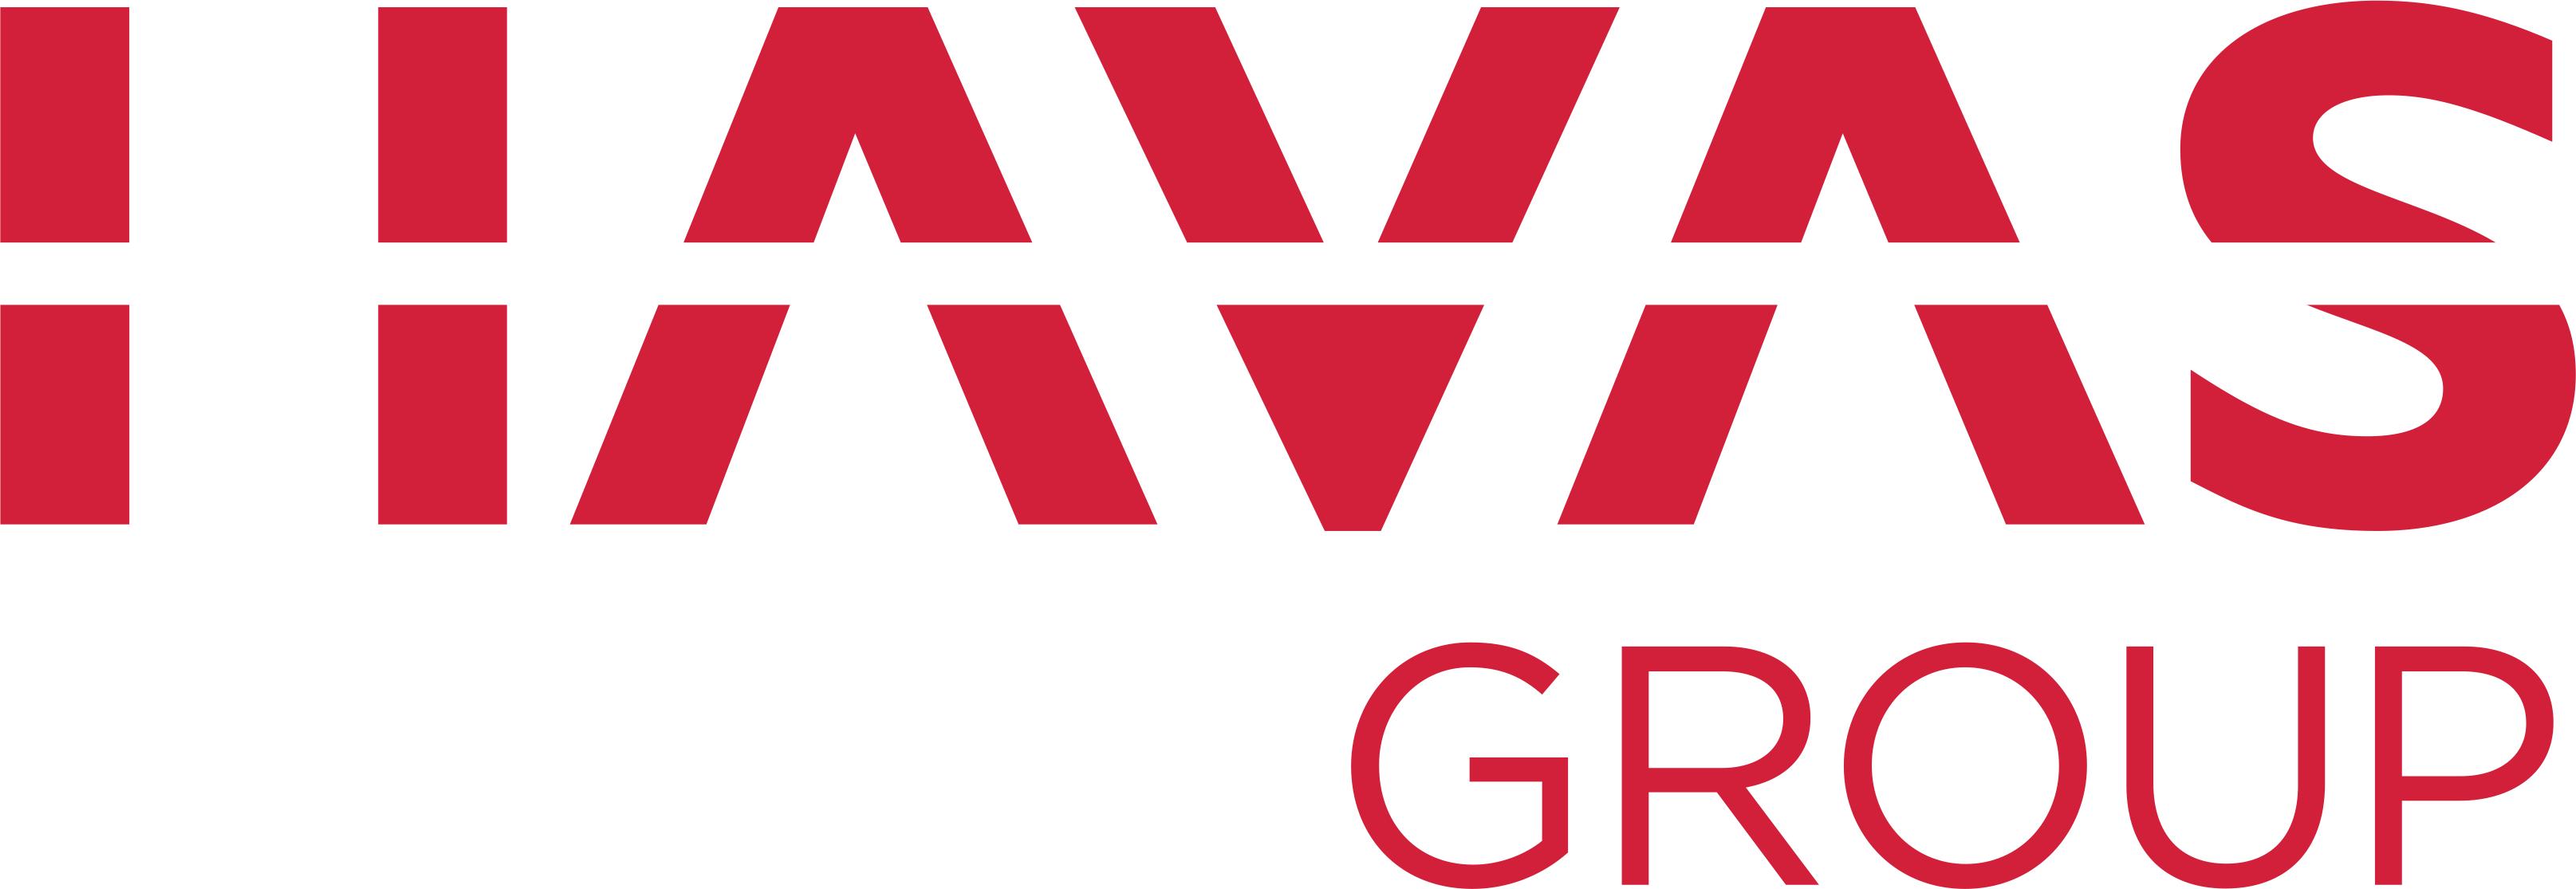 Havas Creative logo